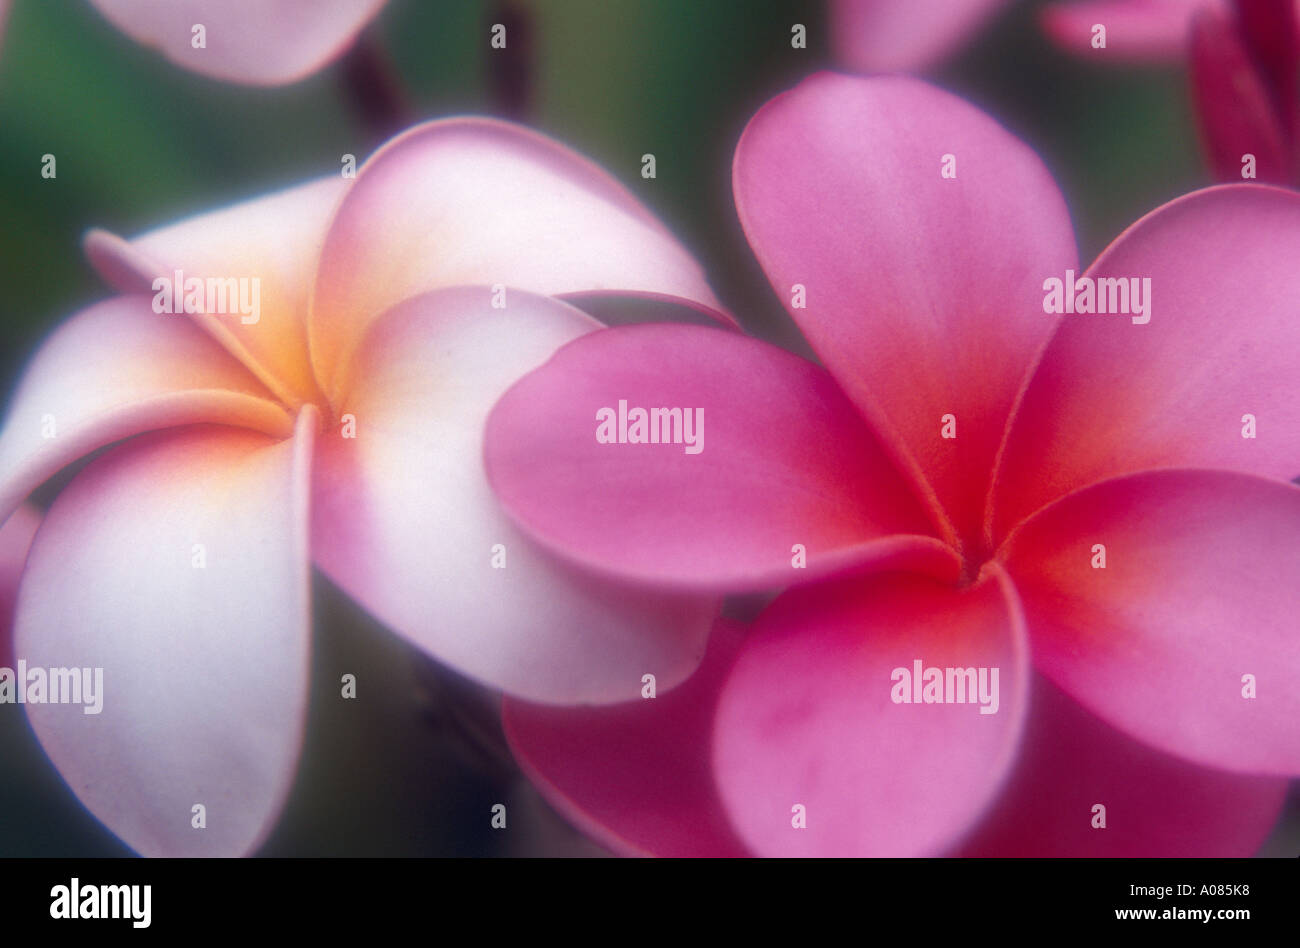 Blooming plumeria tree flowers symbol of Hawaii Maui West Maui Mountains Hawaii USA UNITED STATES - Stock Image